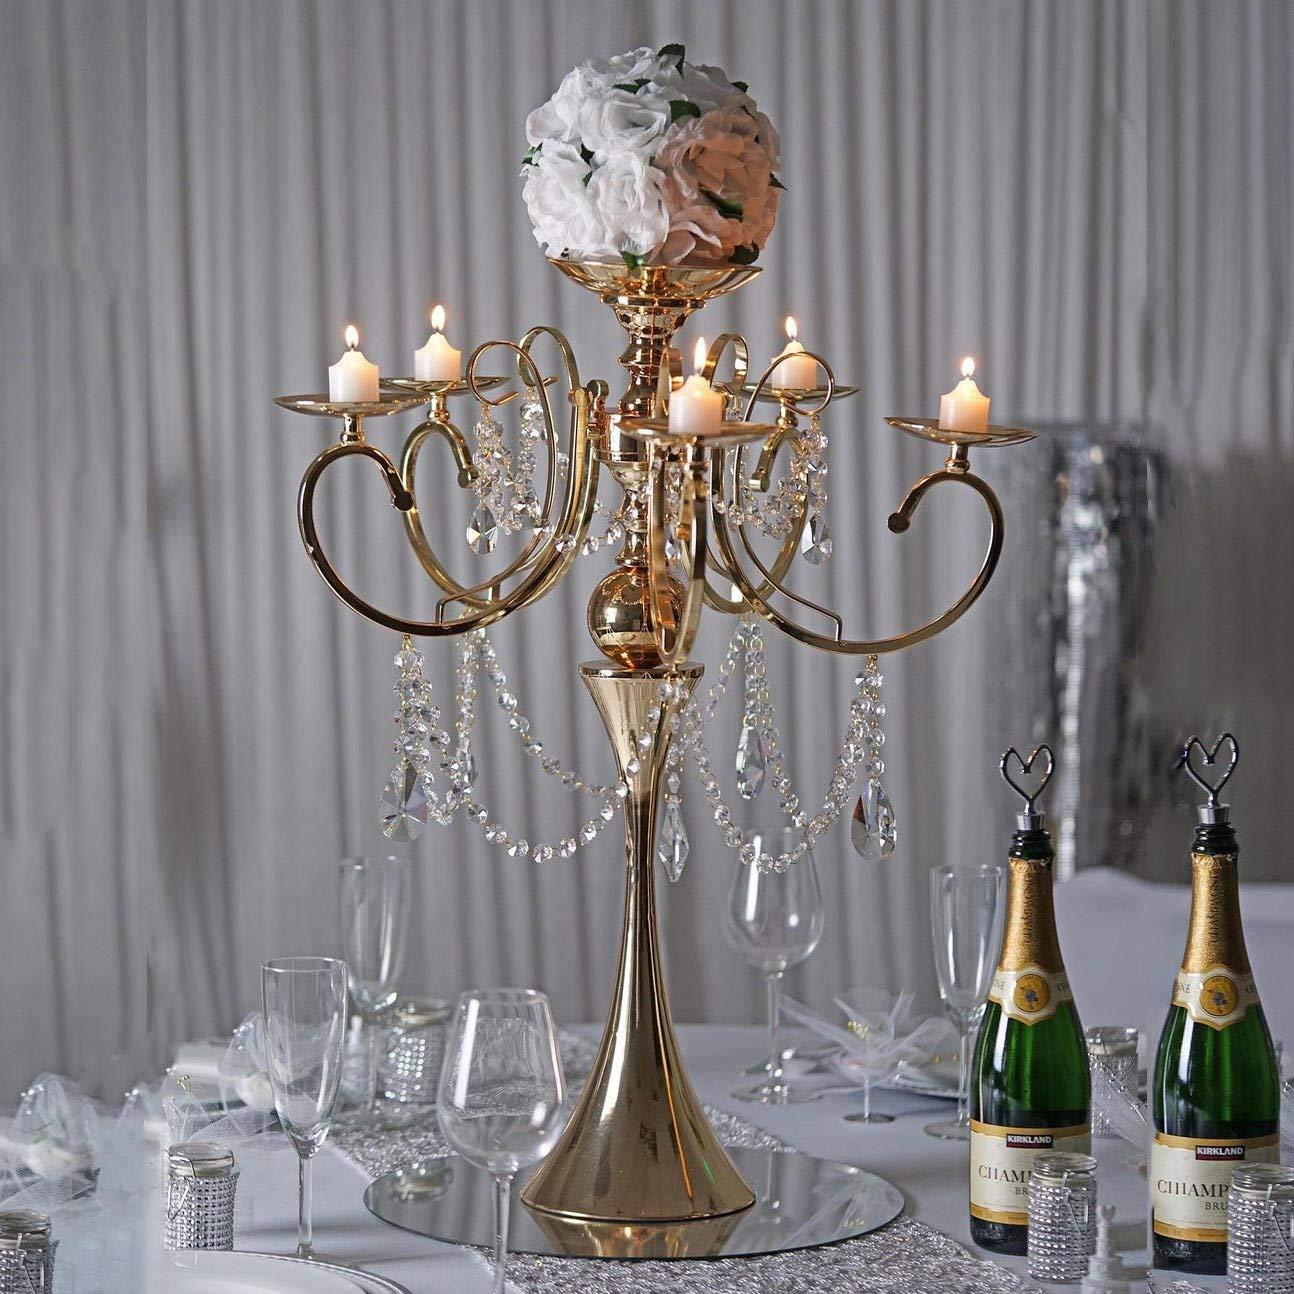 Tableclothsfactory 27.5'' Tall Gold Metal Candelabra Chandelier Votive Candle Holder Wedding Centerpiece - with Acrylic Chains by Tableclothsfactory